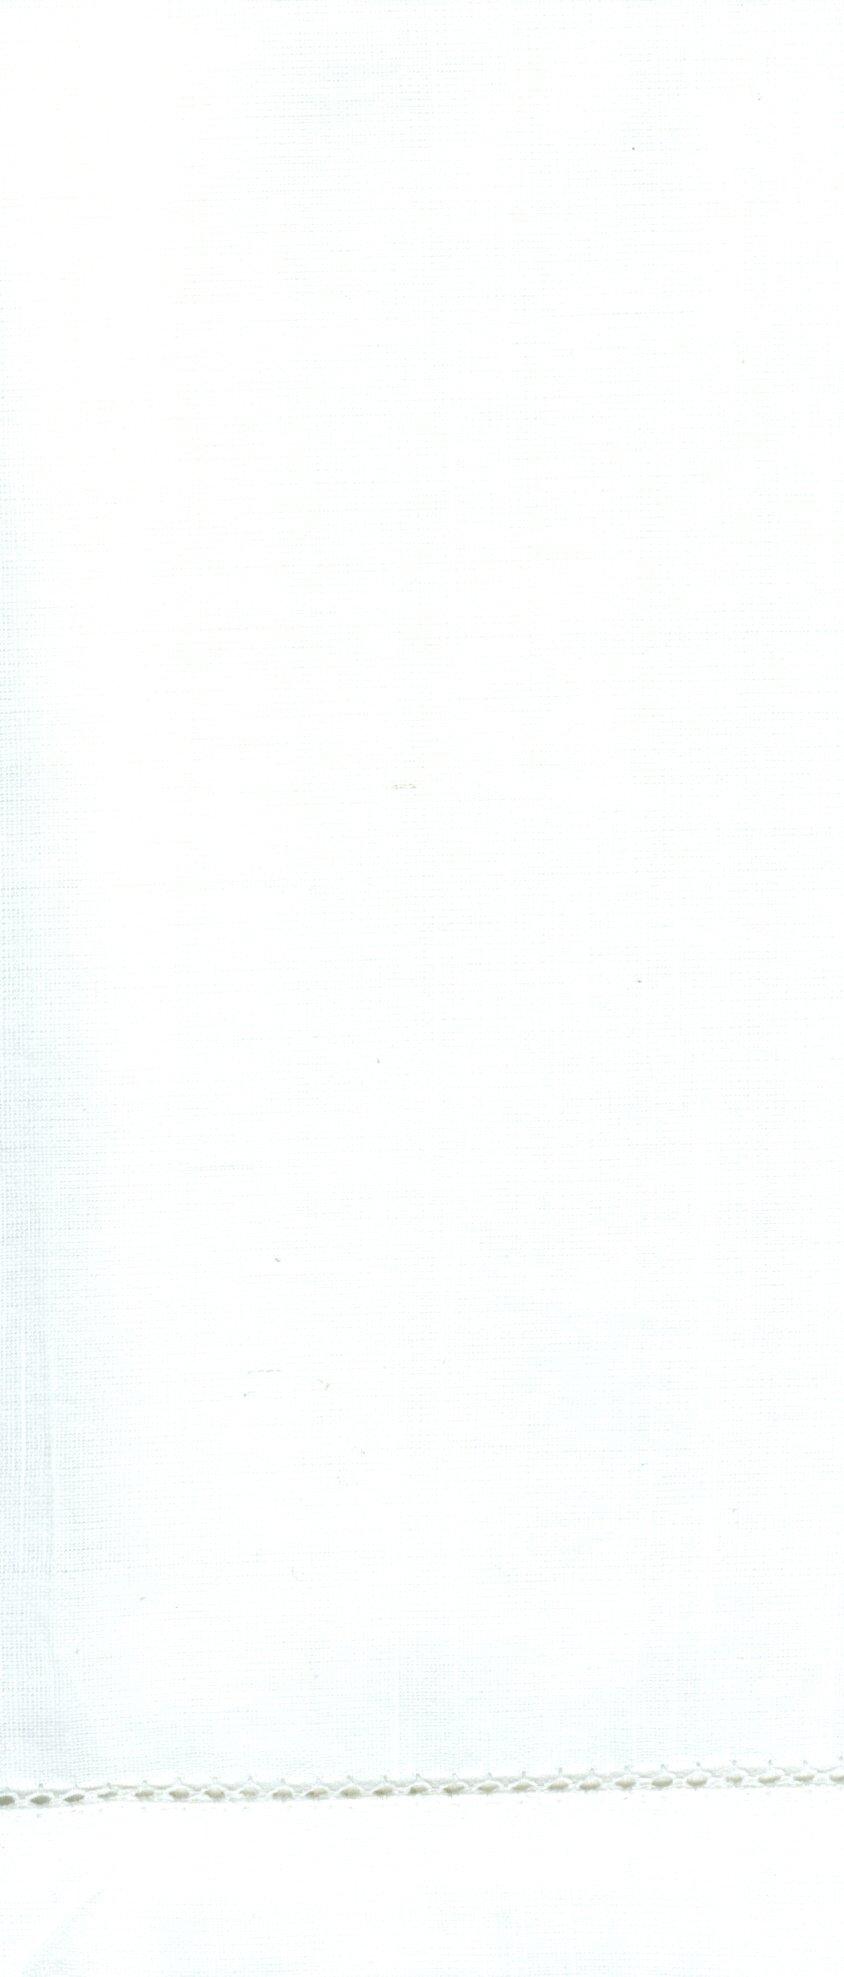 Hemstitch Dinner Napkins White 1 Dozen by Something Different Linen by Something Different Linen (Image #3)